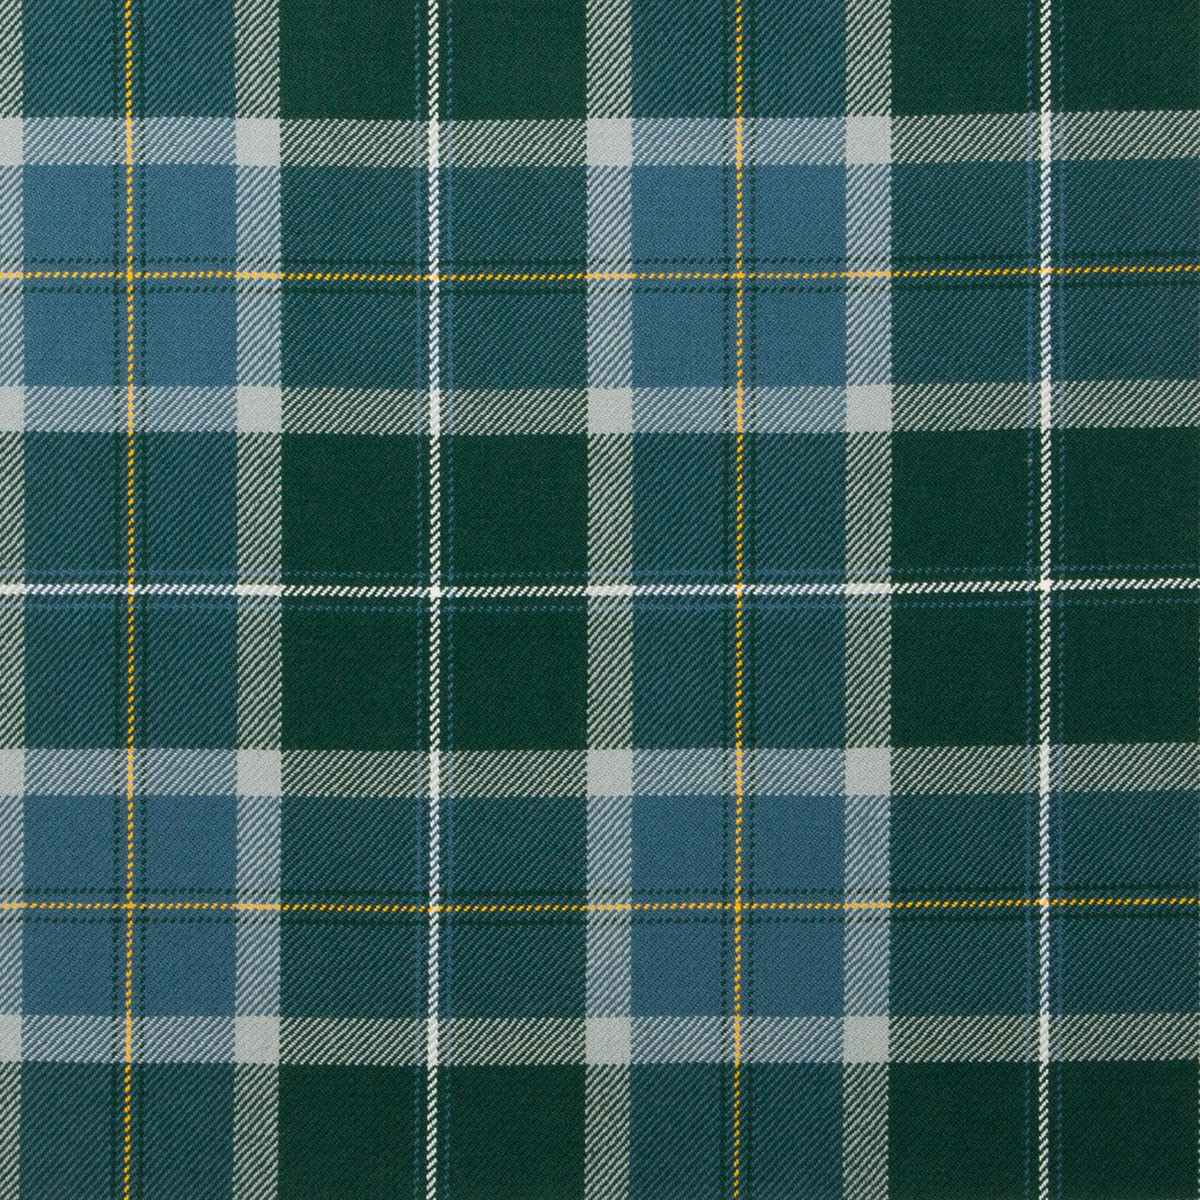 Scottish Borderland Light Weight Tartan Fabric-Front